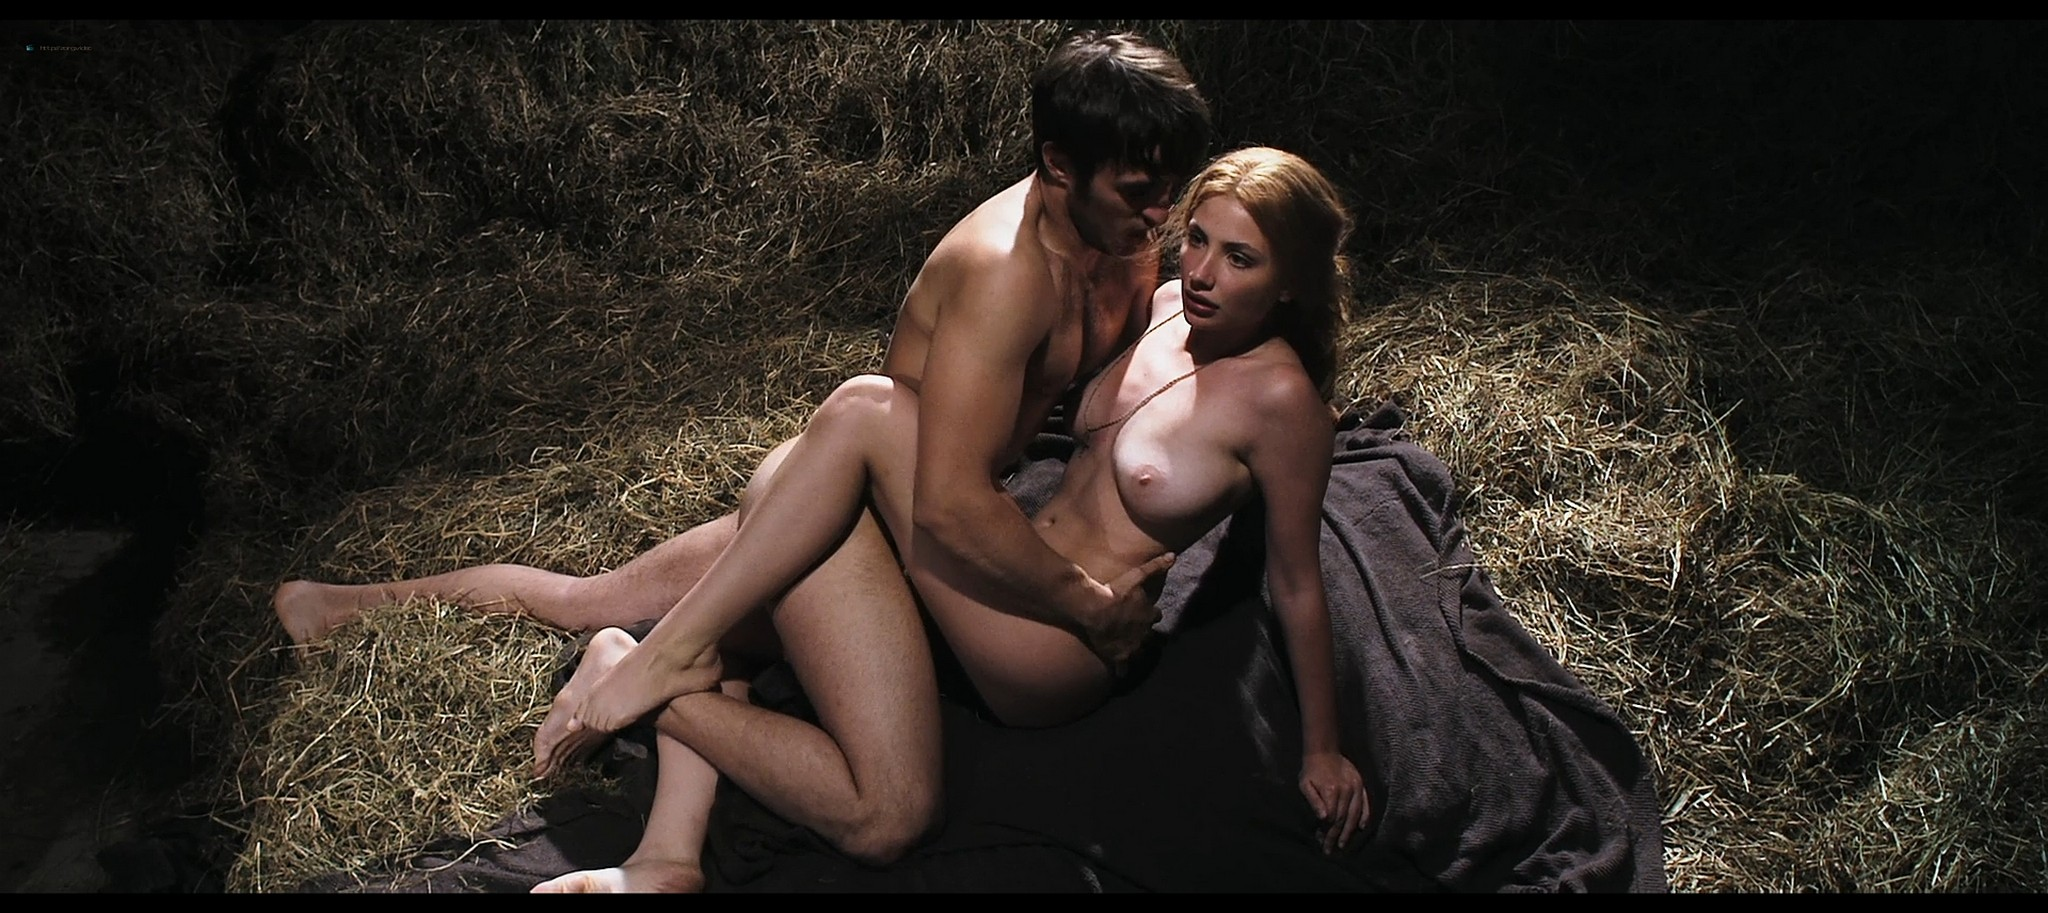 Asia Argento nude and Miriam Giovanelli nude in Darios Argento Dracula 3d 2012 HD 1080p BluRay 5